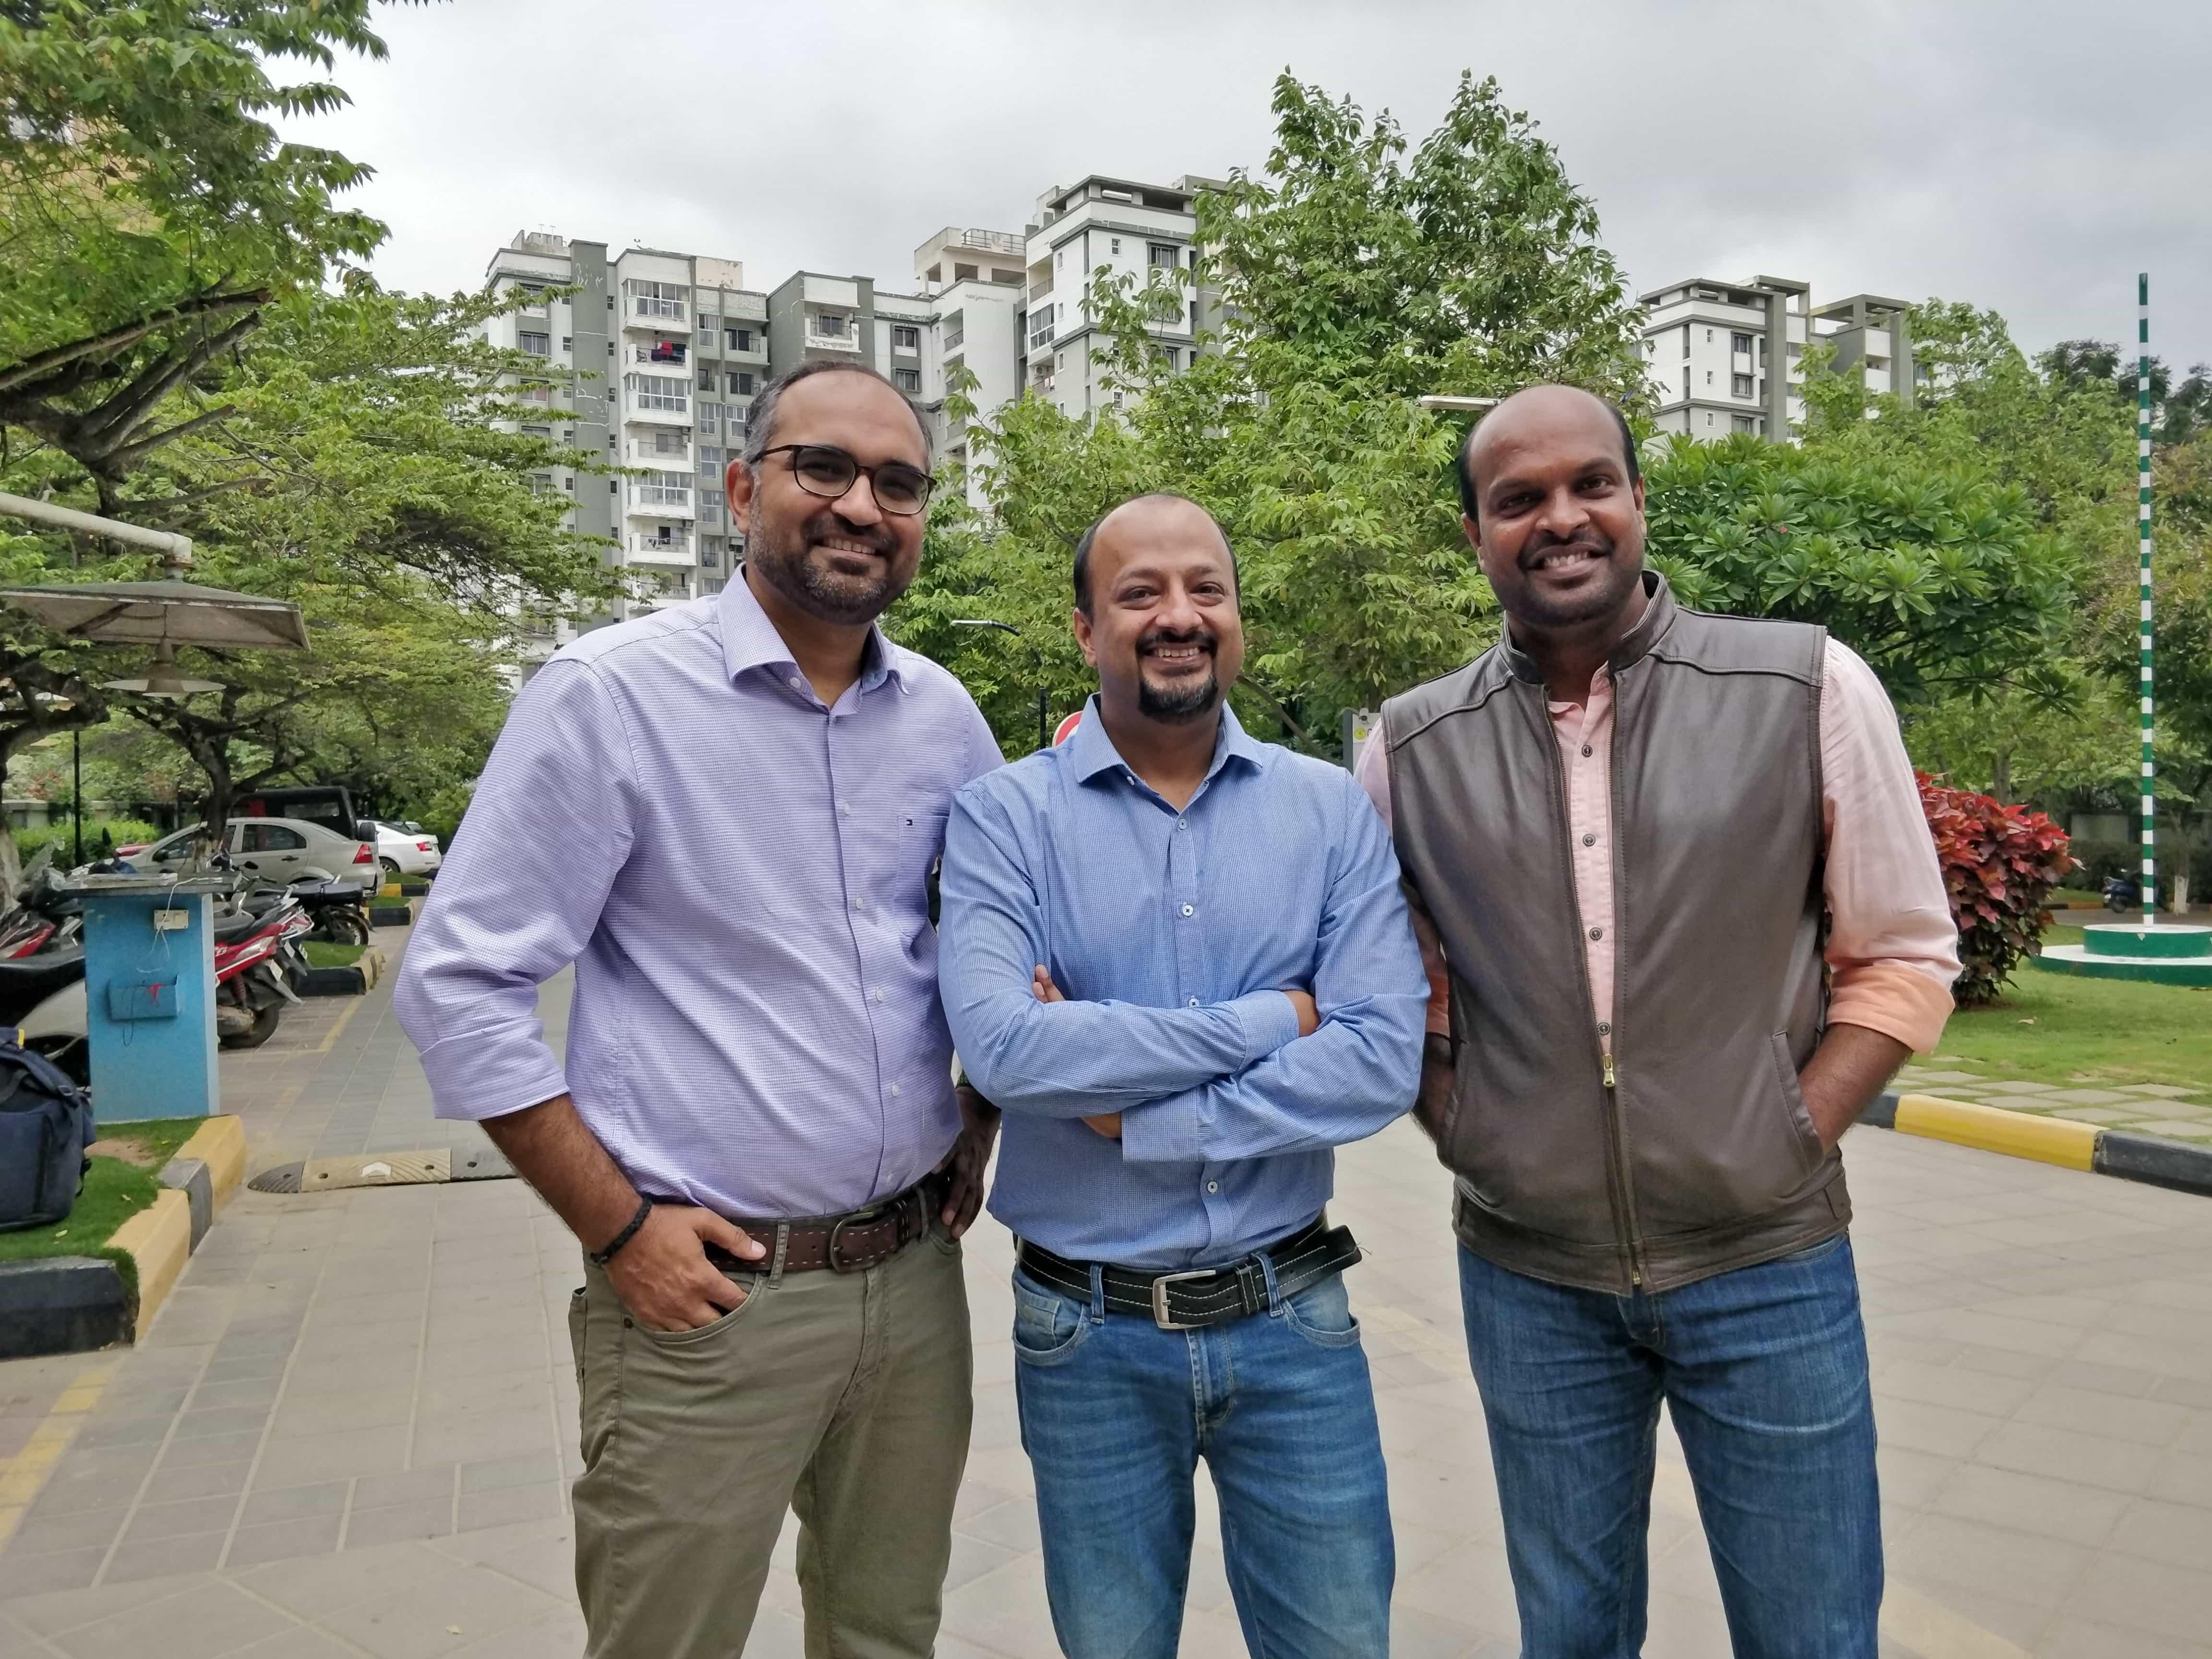 Three co-founders of Mygate: Vijay Arisetty, Abhishek K, and Shreyans Daga